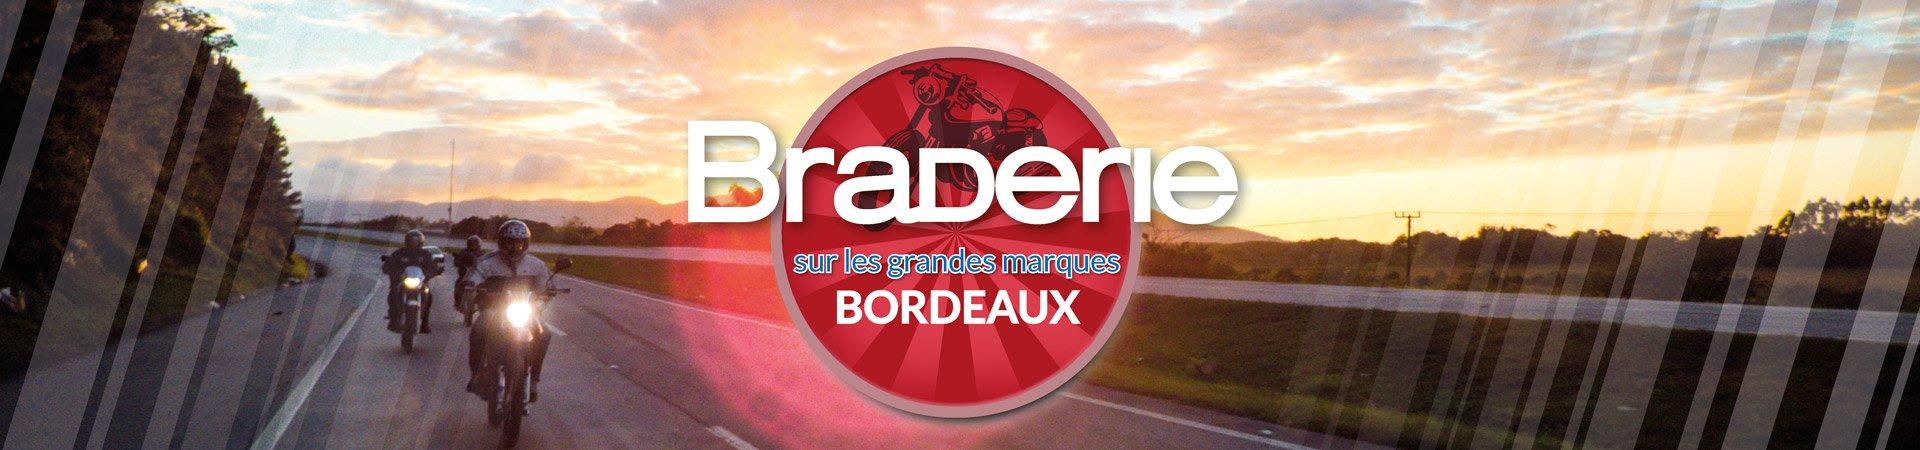 BRADERIE CARDY BORDEAUX 2018